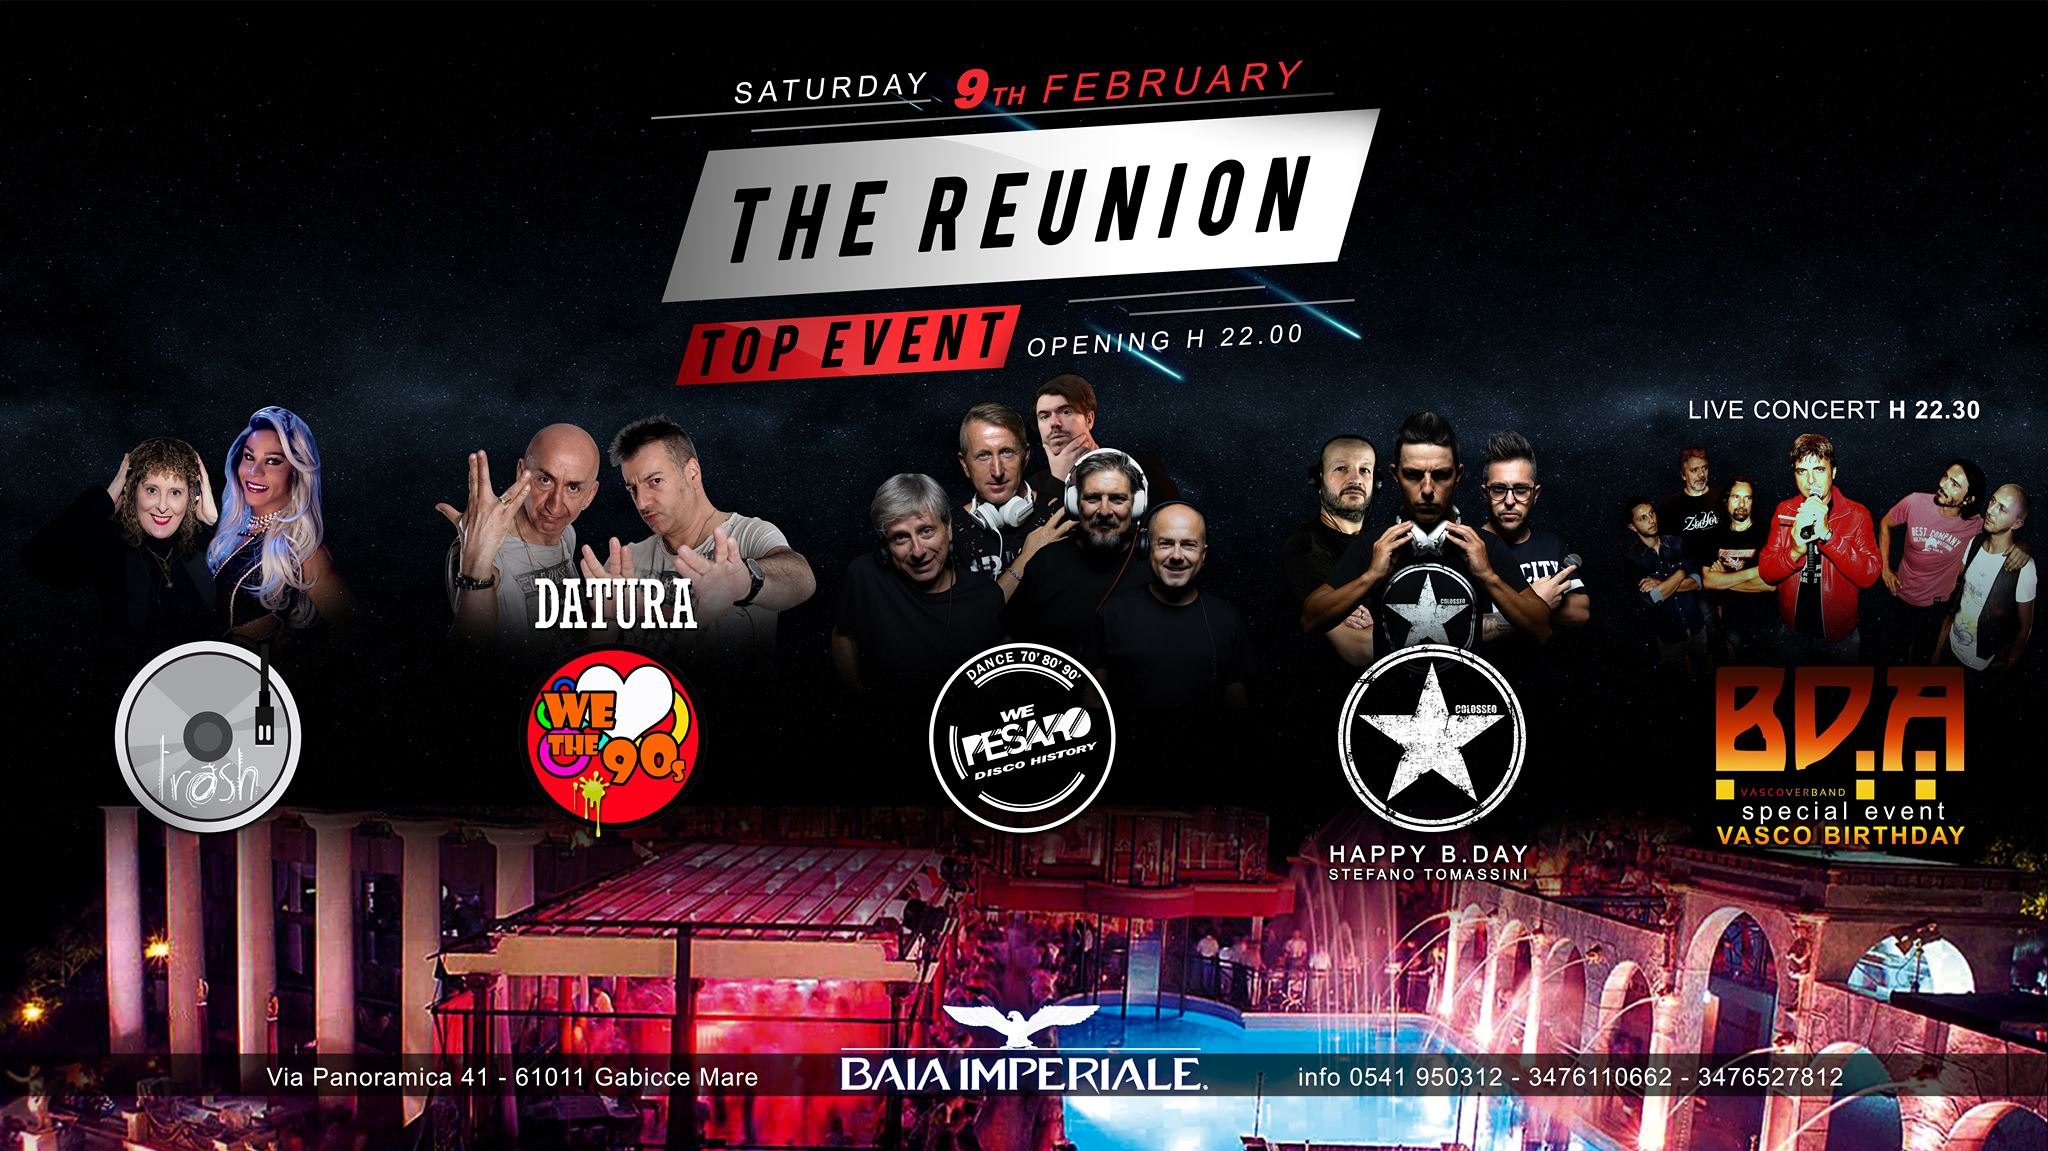 The Reunion Discoteca Baia Imperiale Gabicce Mare